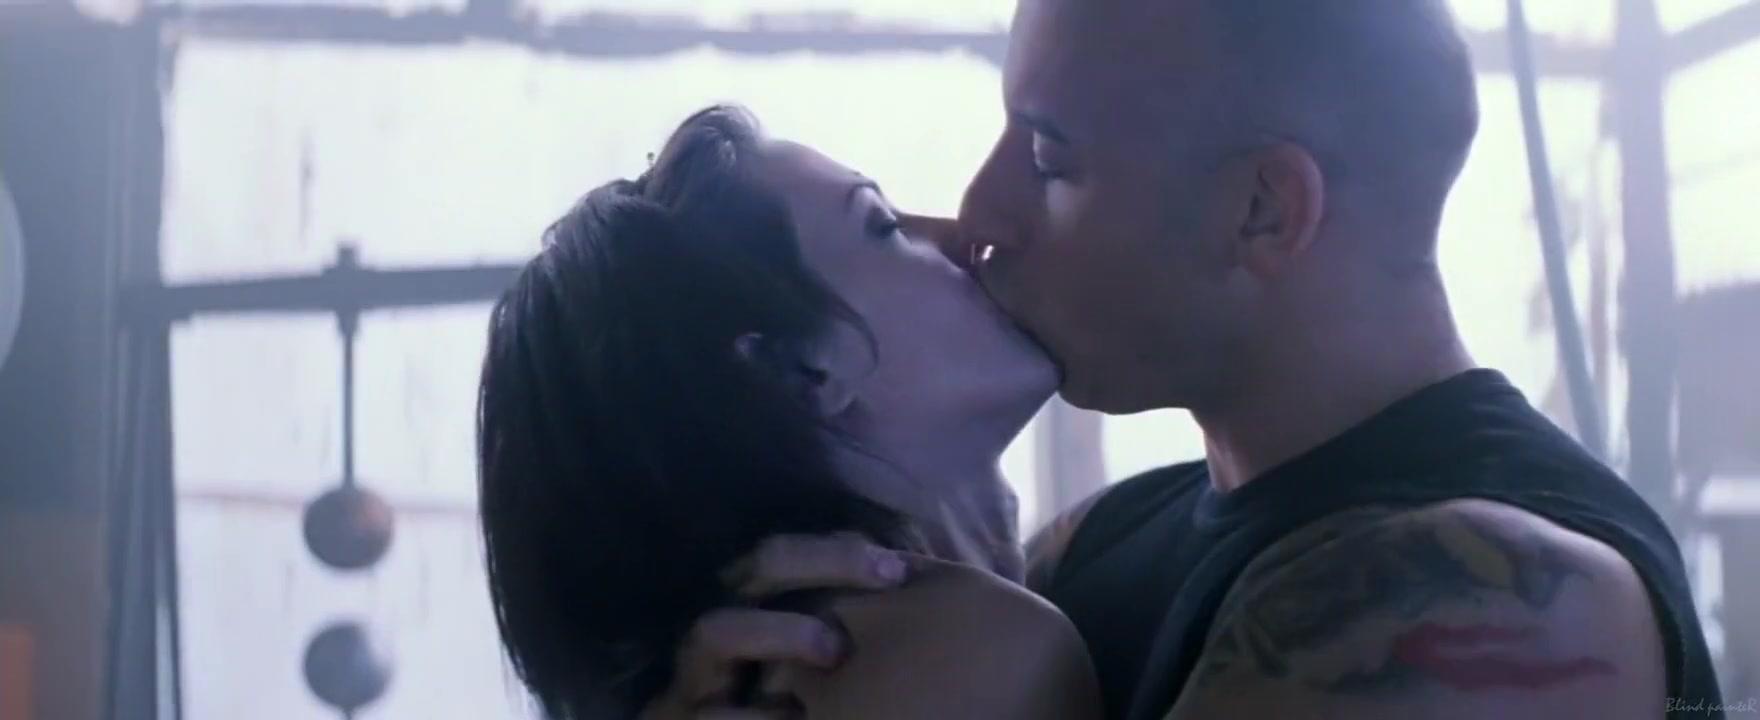 Hot Nude Xvideos gay brent corrigan